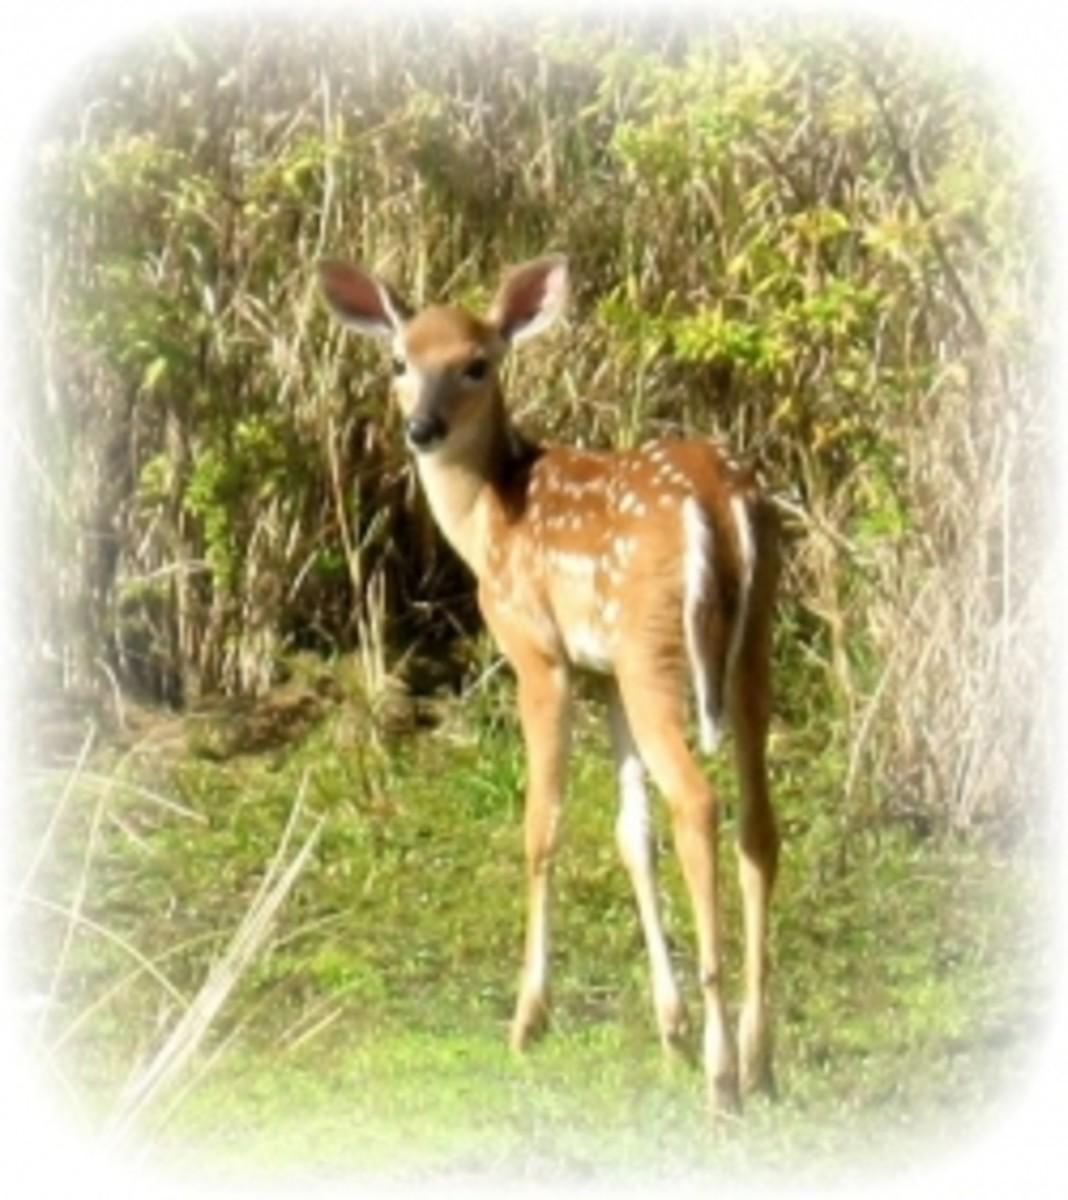 Florida Wildlife on the Golf Course